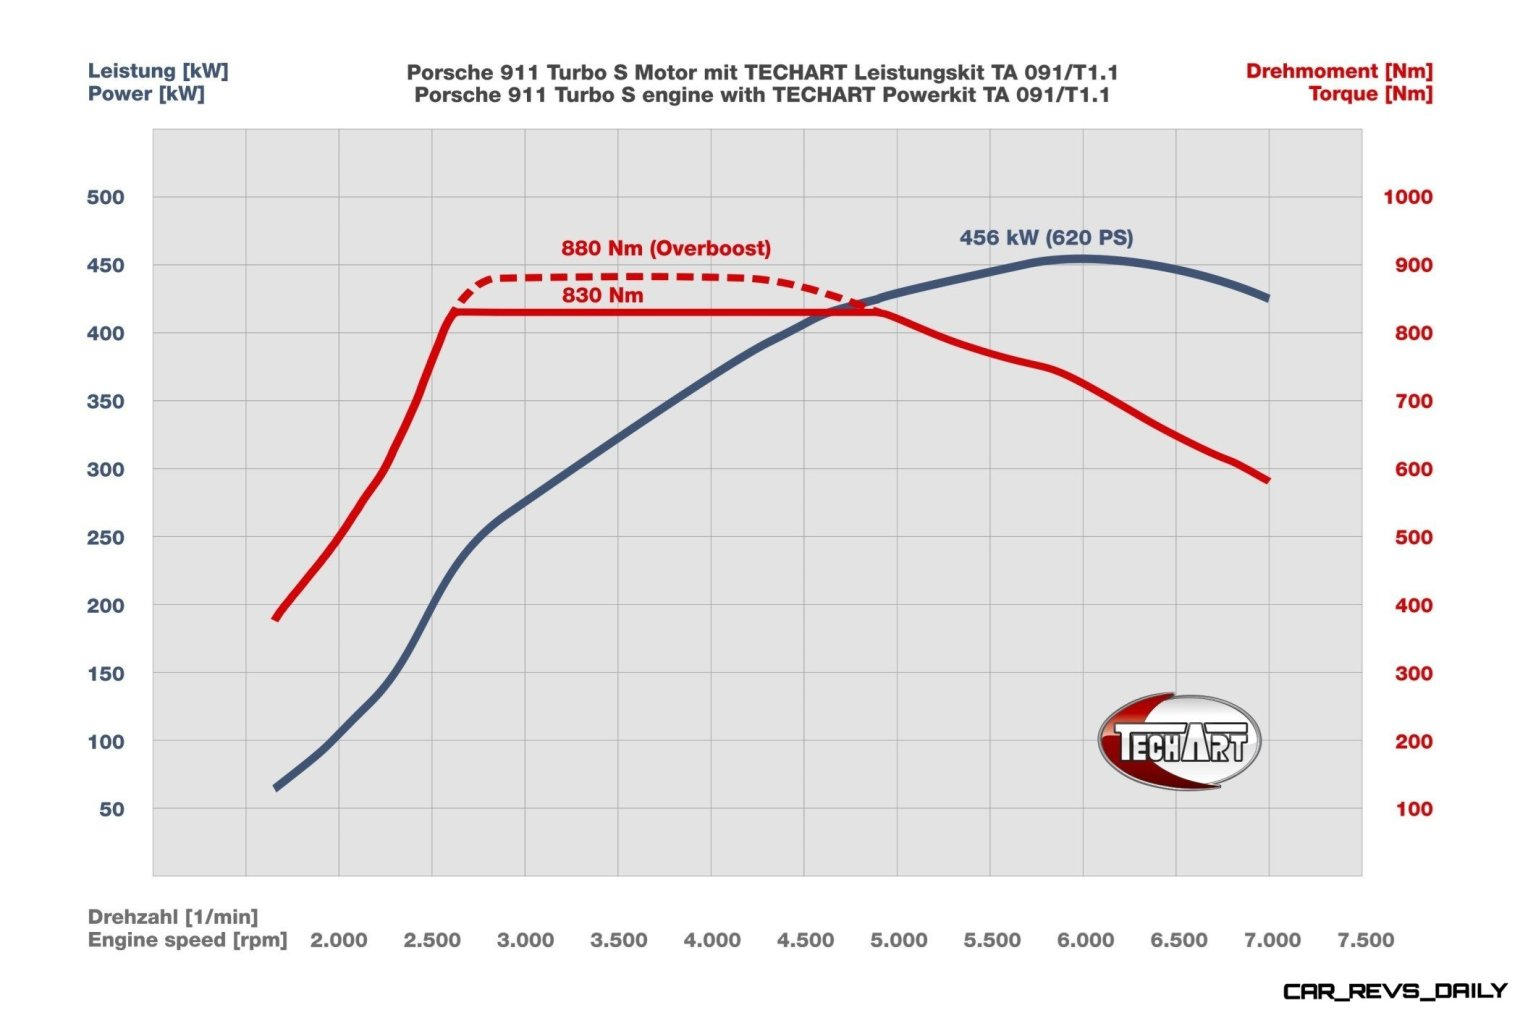 TECHART_Power_Kit_TA091_T1.1_diagram